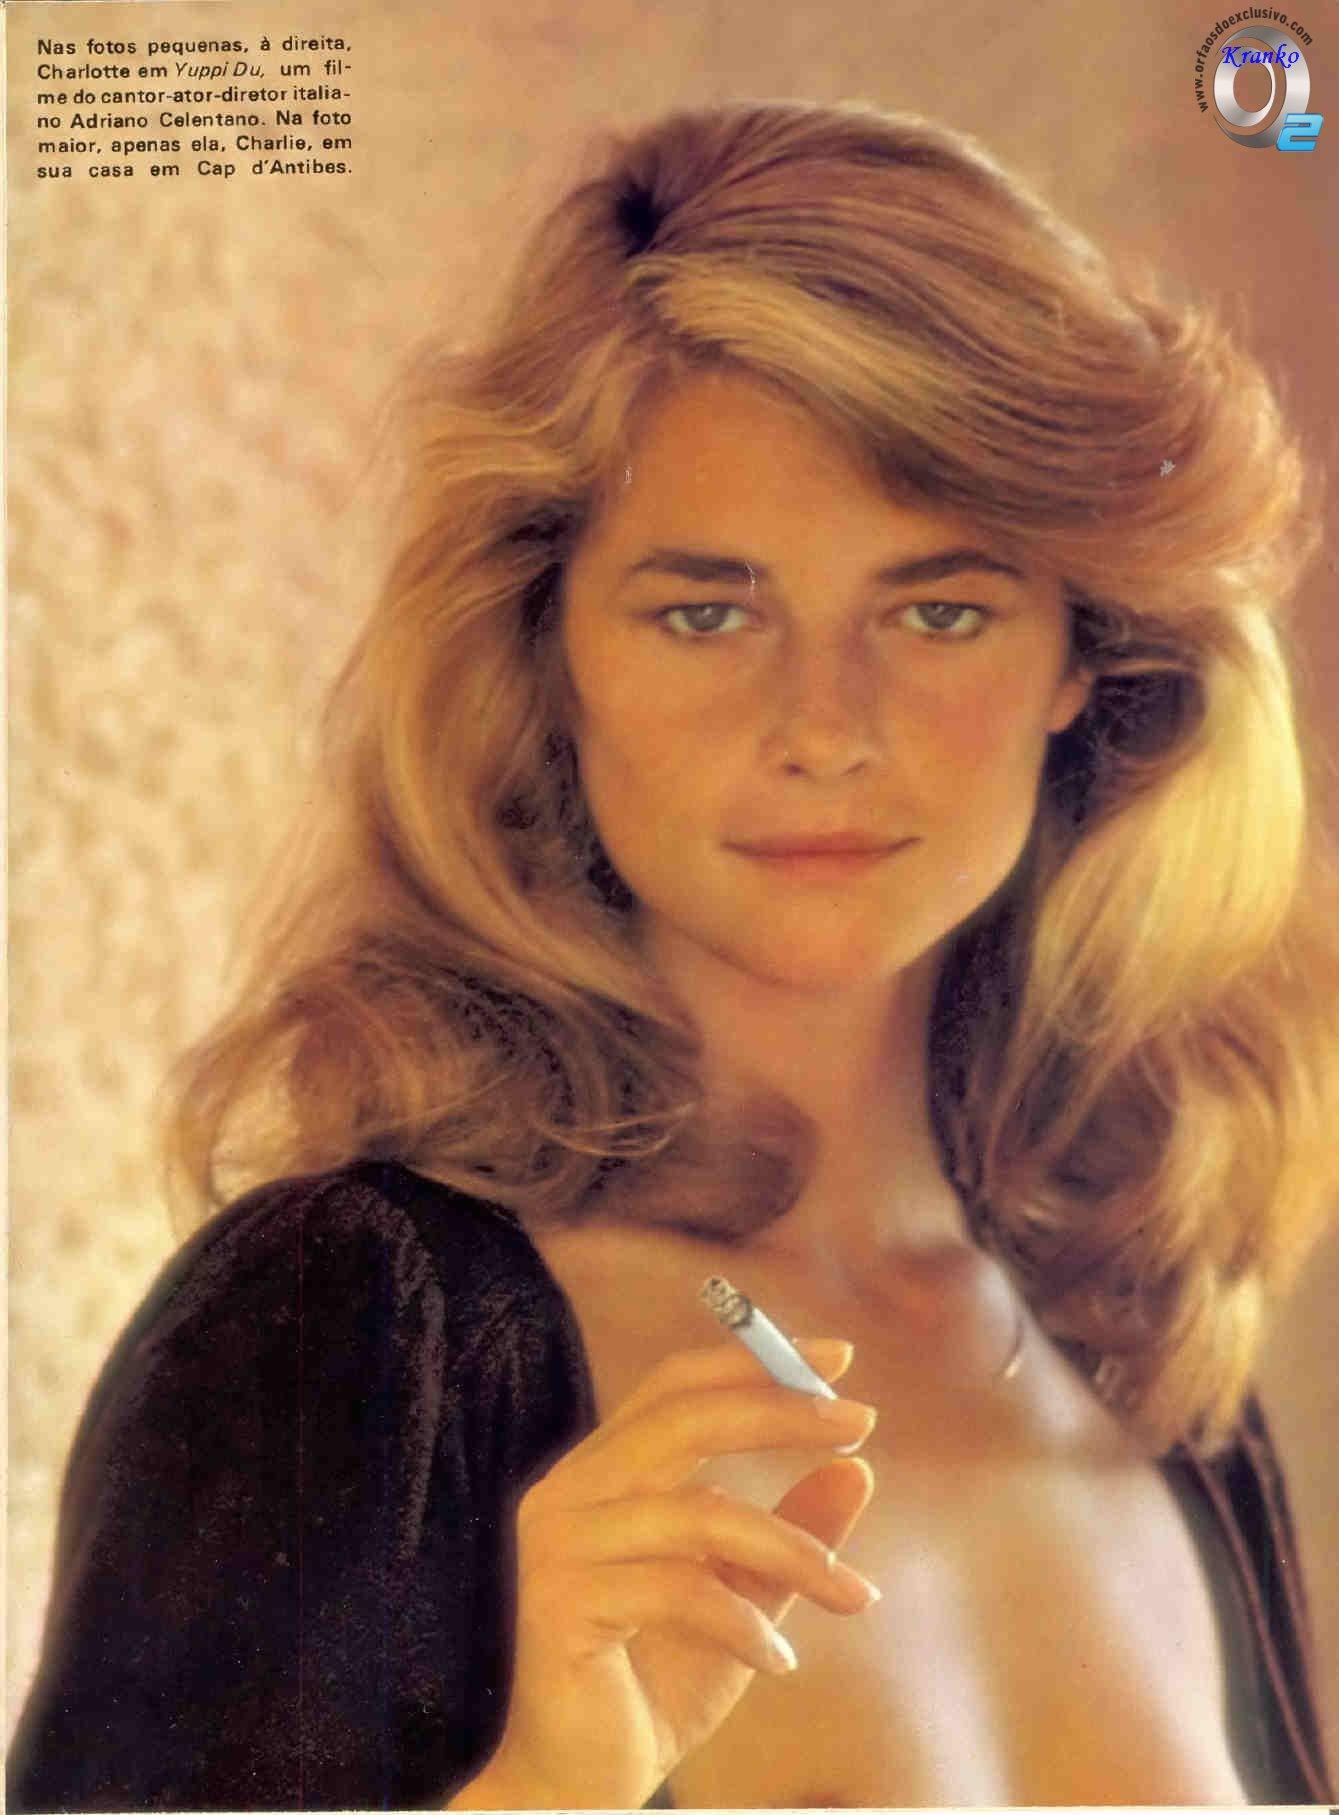 Fotos Charlotte Rampling nua, Fotos da Charlotte Rampling na playboy, todas as fotos pelada, playboy de novembro de 1975